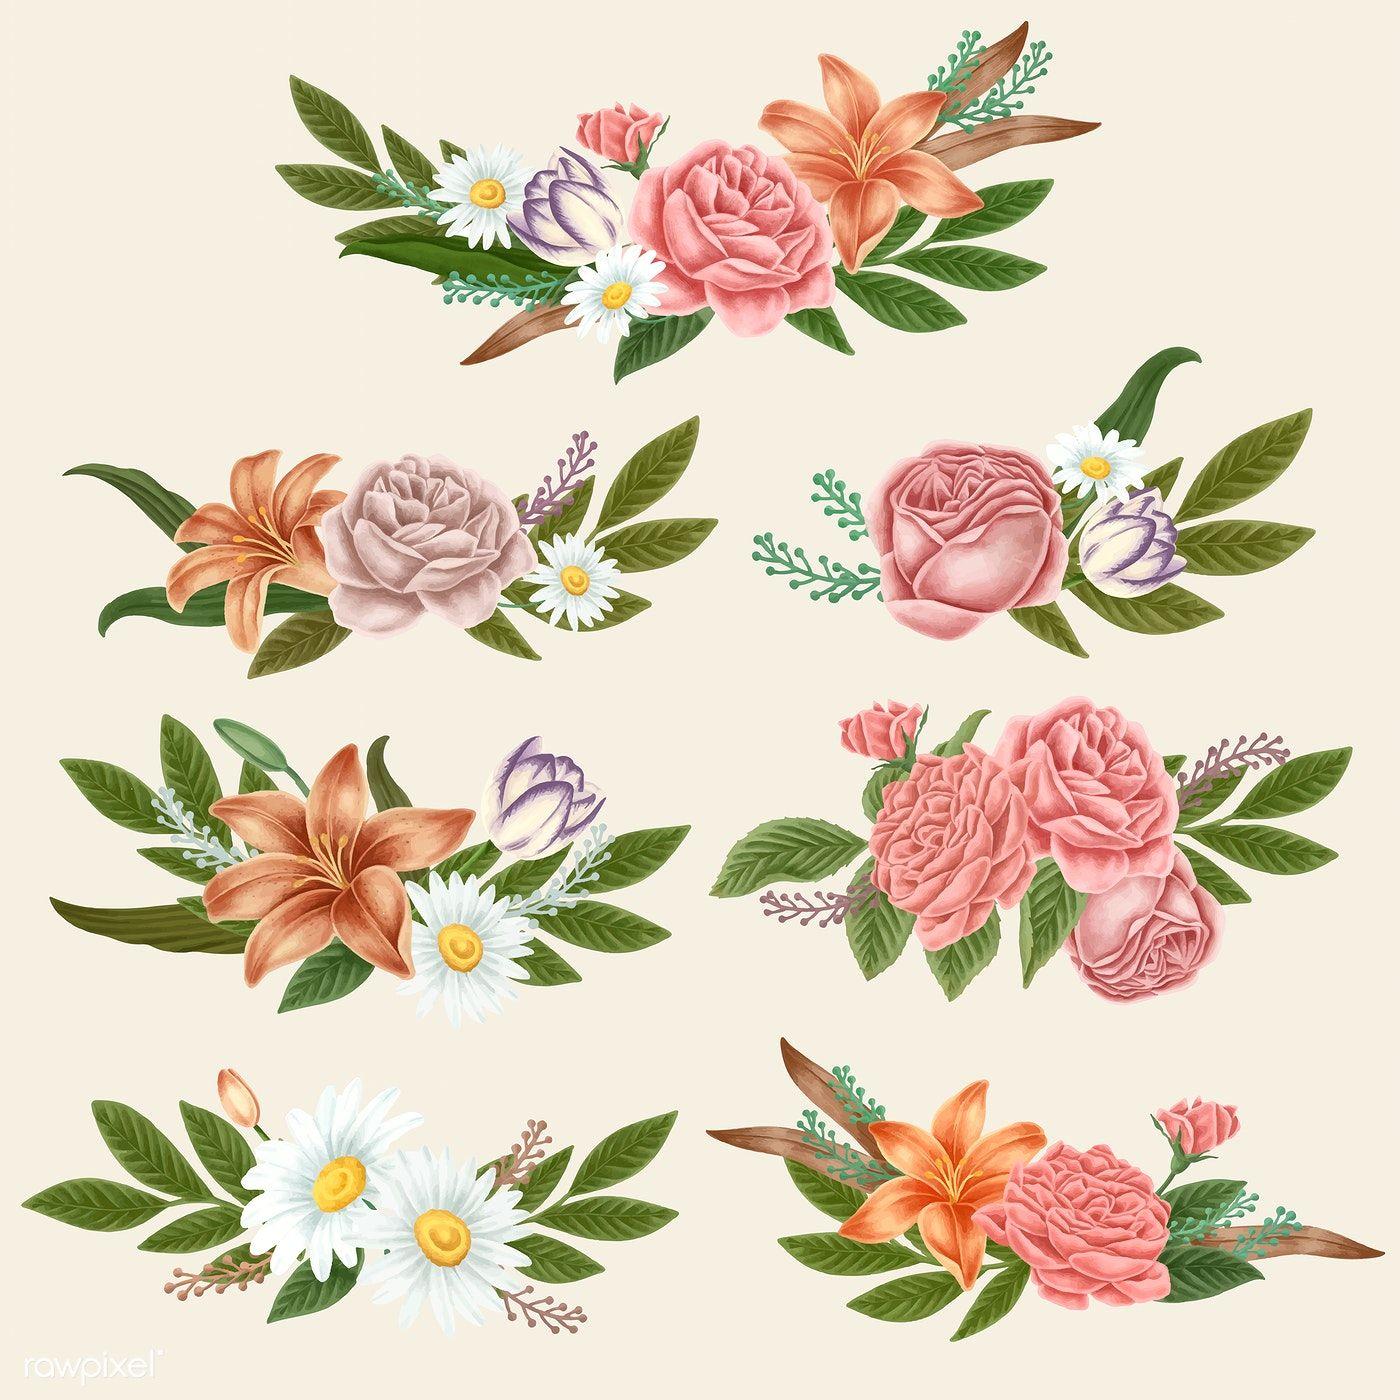 Download Premium Vector Of Vintage Flower Bouquets Vector 2100678 In 2020 Vintage Flowers Summer Flower Bouquet Flowers Bouquet